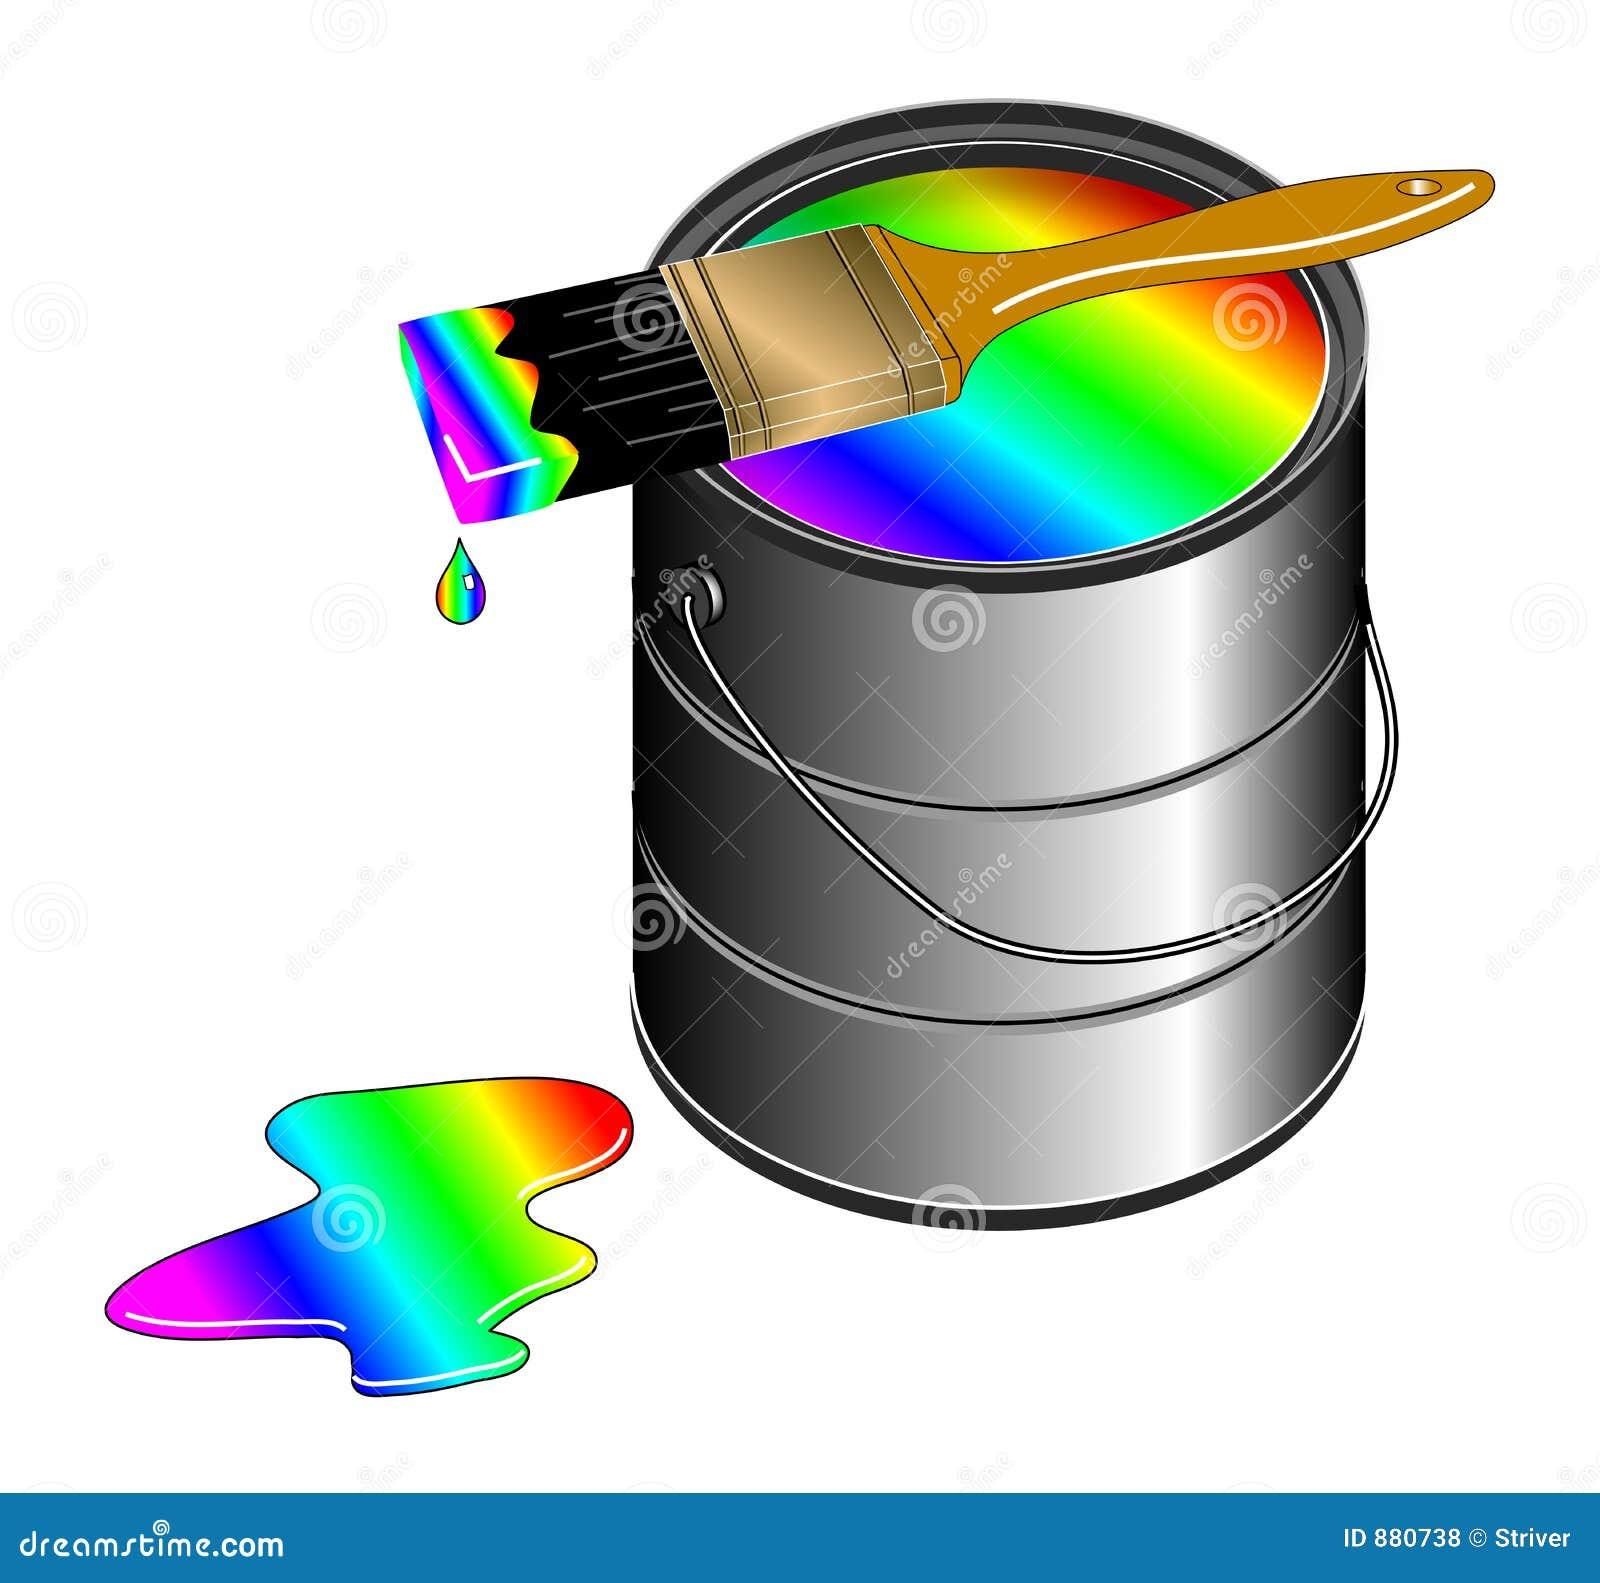 - farby rainbow